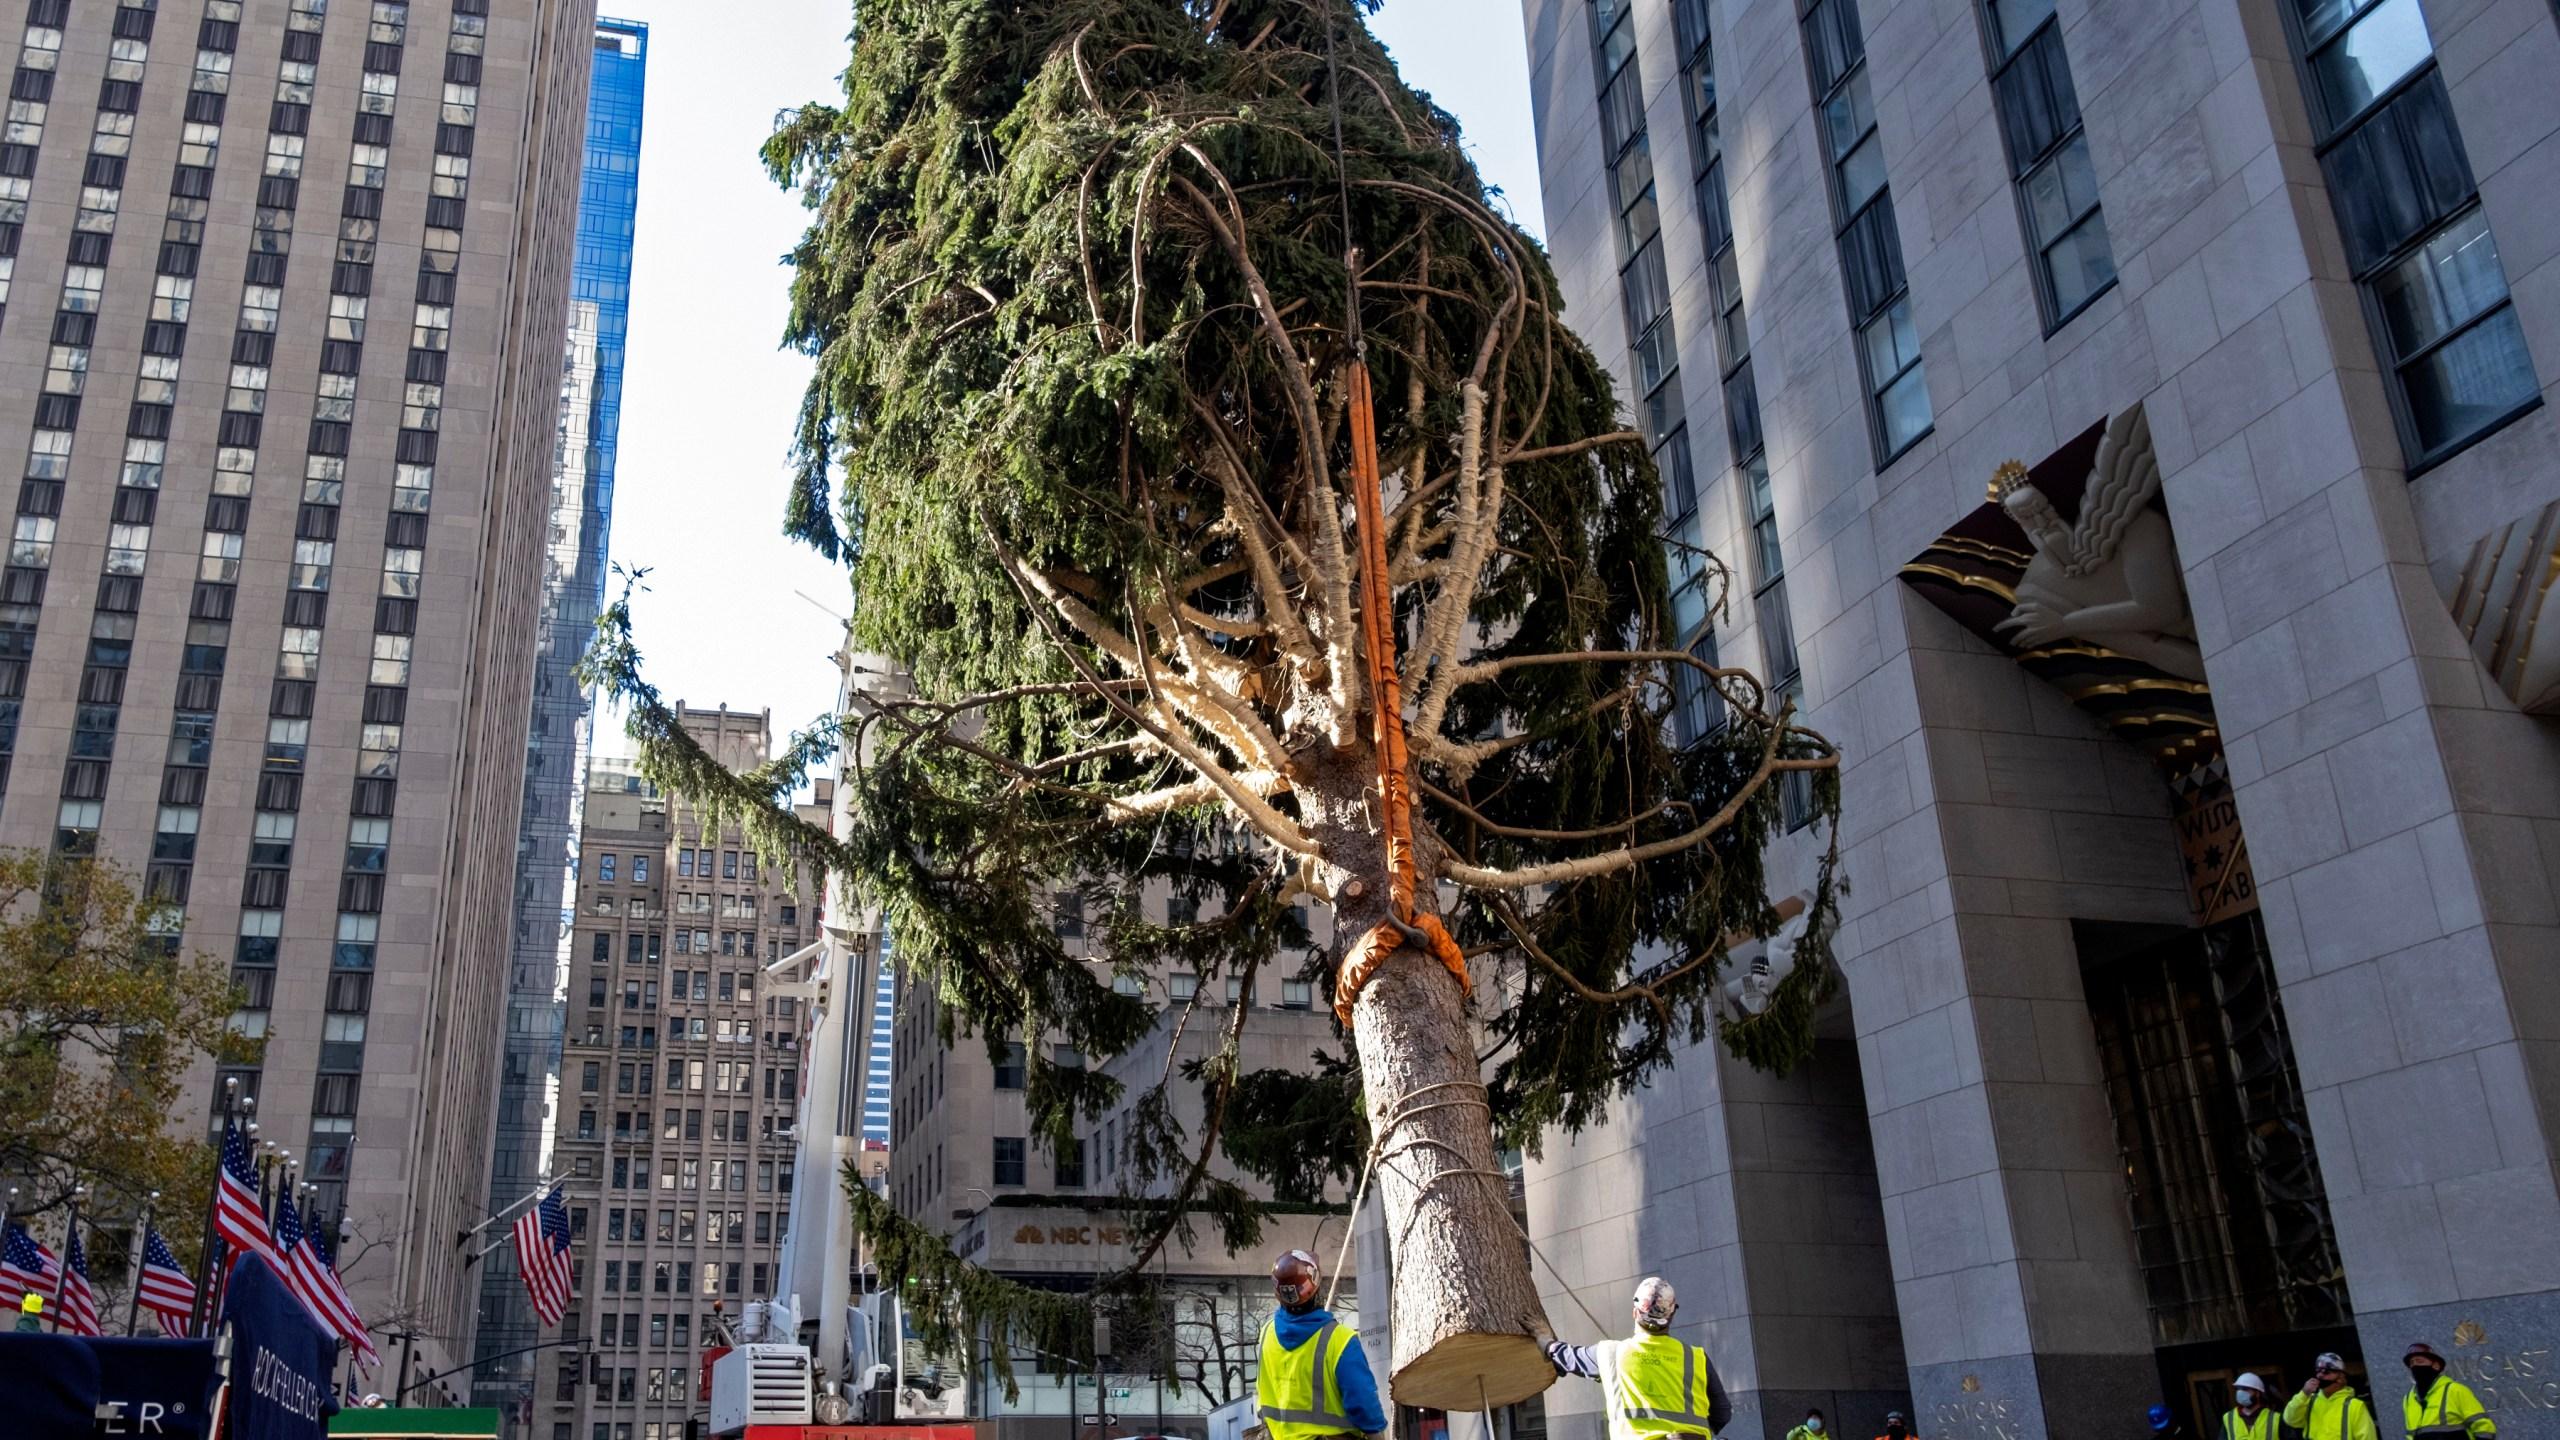 Rockefeller Christmas Tree 2020 December 8 2020 Went Dark Rockefeller Center Christmas tree goes up; lighting Dec. 2